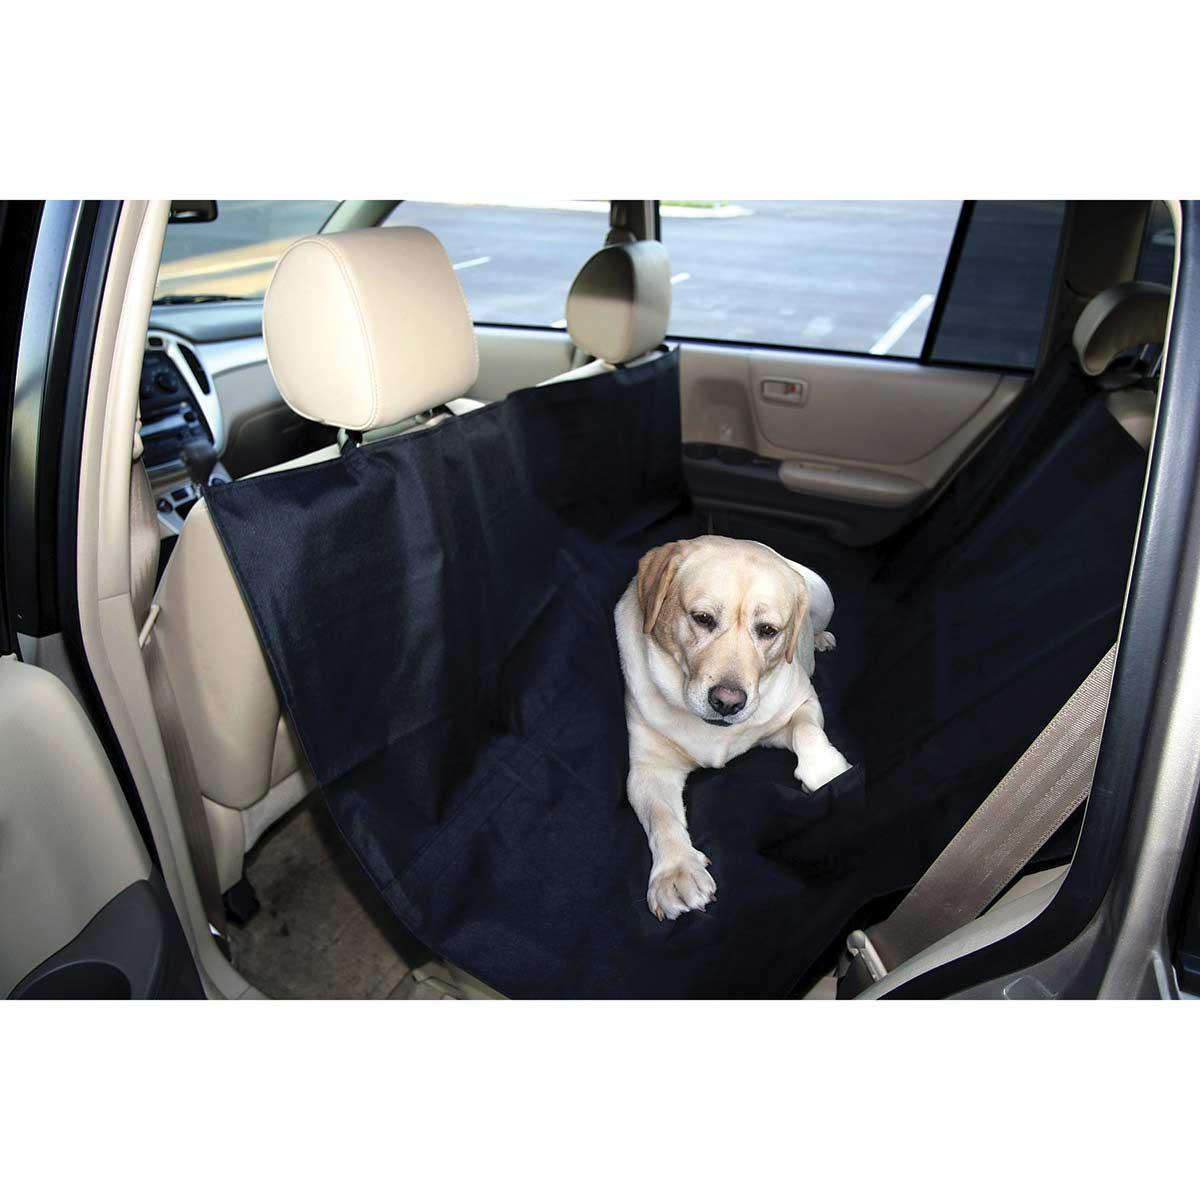 Outward Hound Travel Pupsheild Car Hammock - 55 inches by 55 inches wide